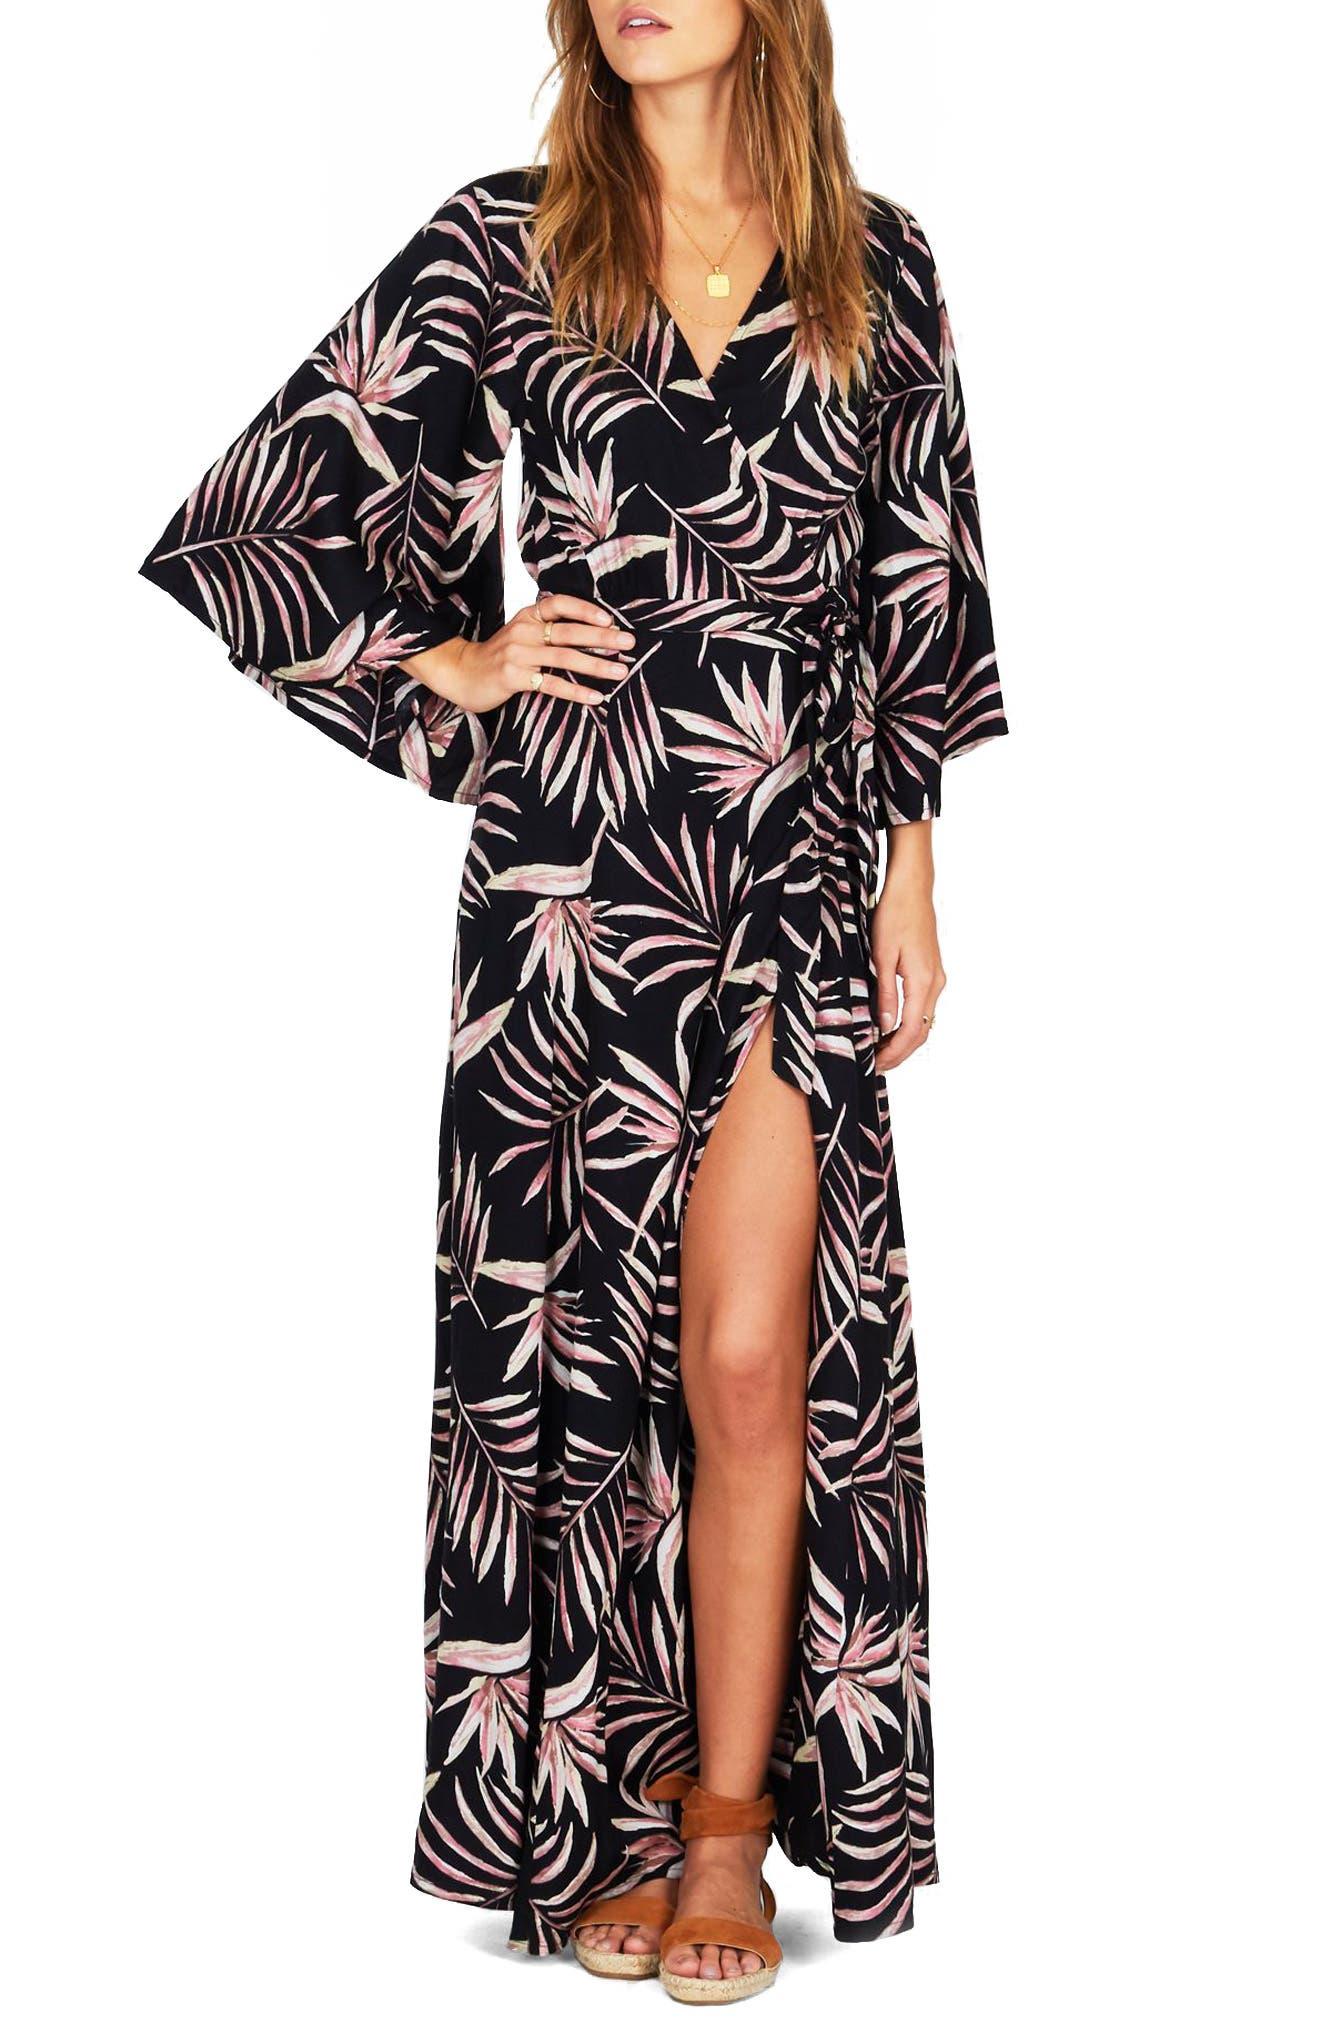 Isle of Love Wrap Dress,                         Main,                         color, 001